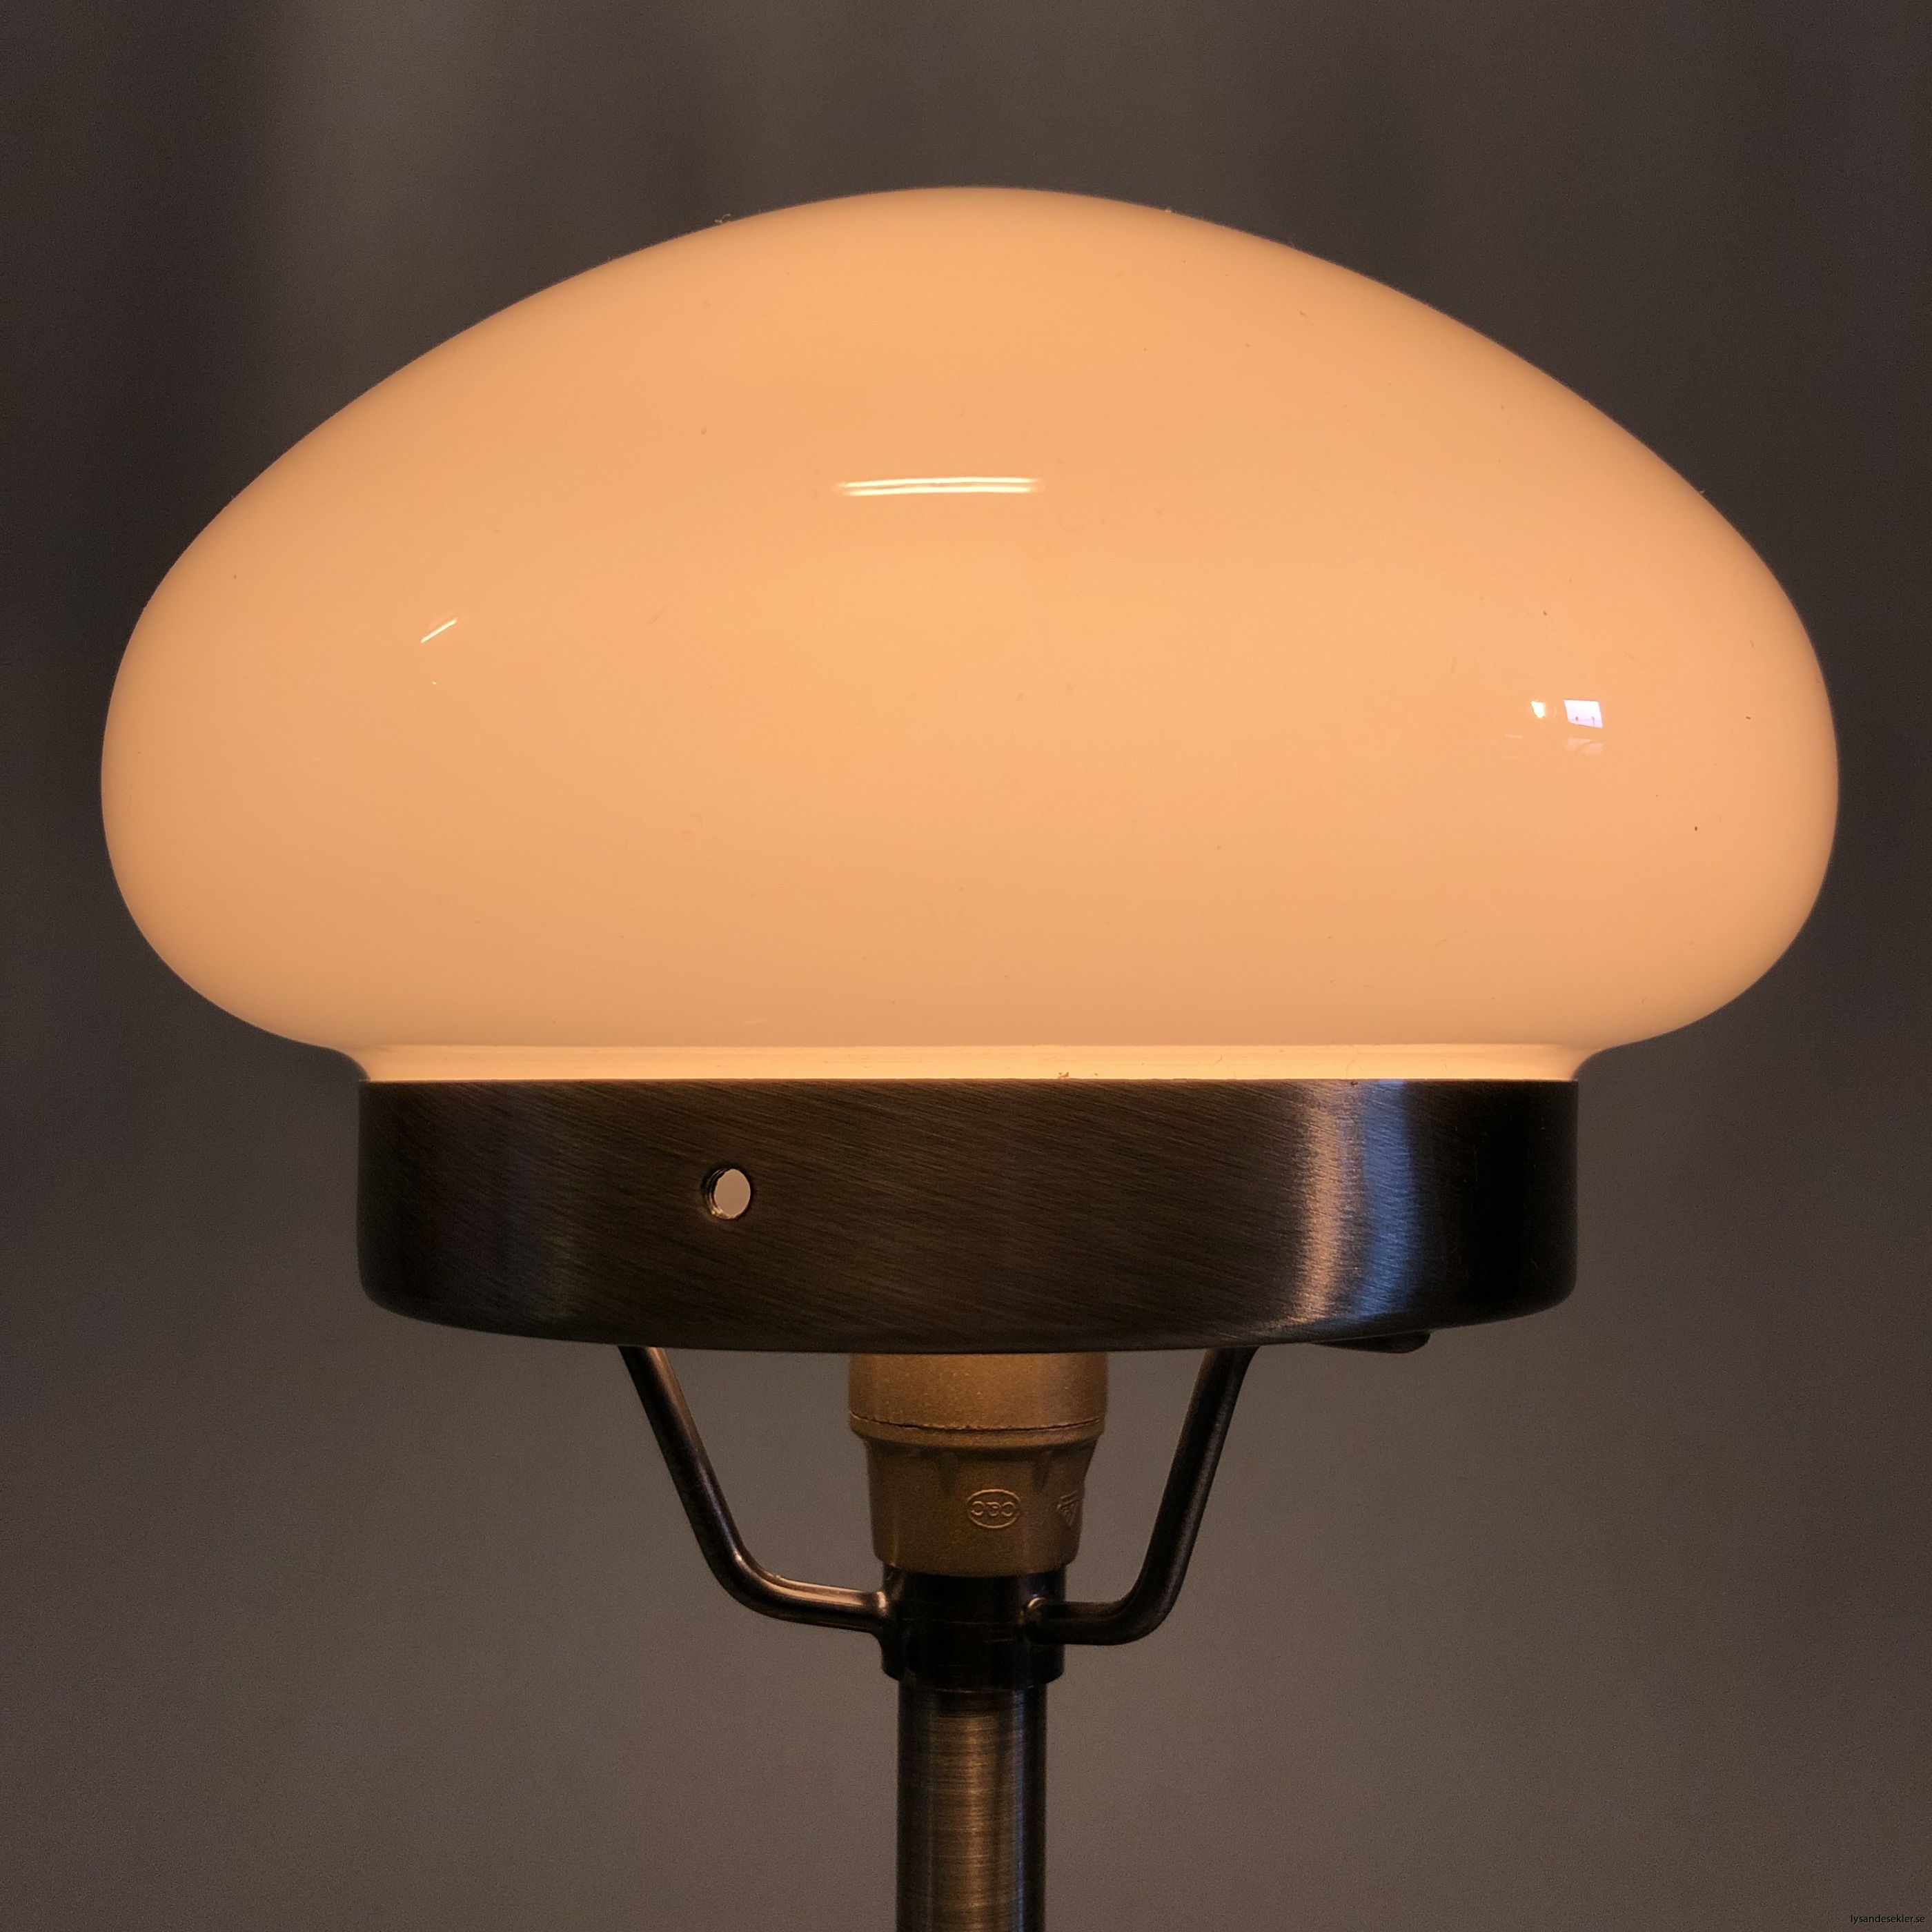 liten strindbergslampa 12 cm skärm3